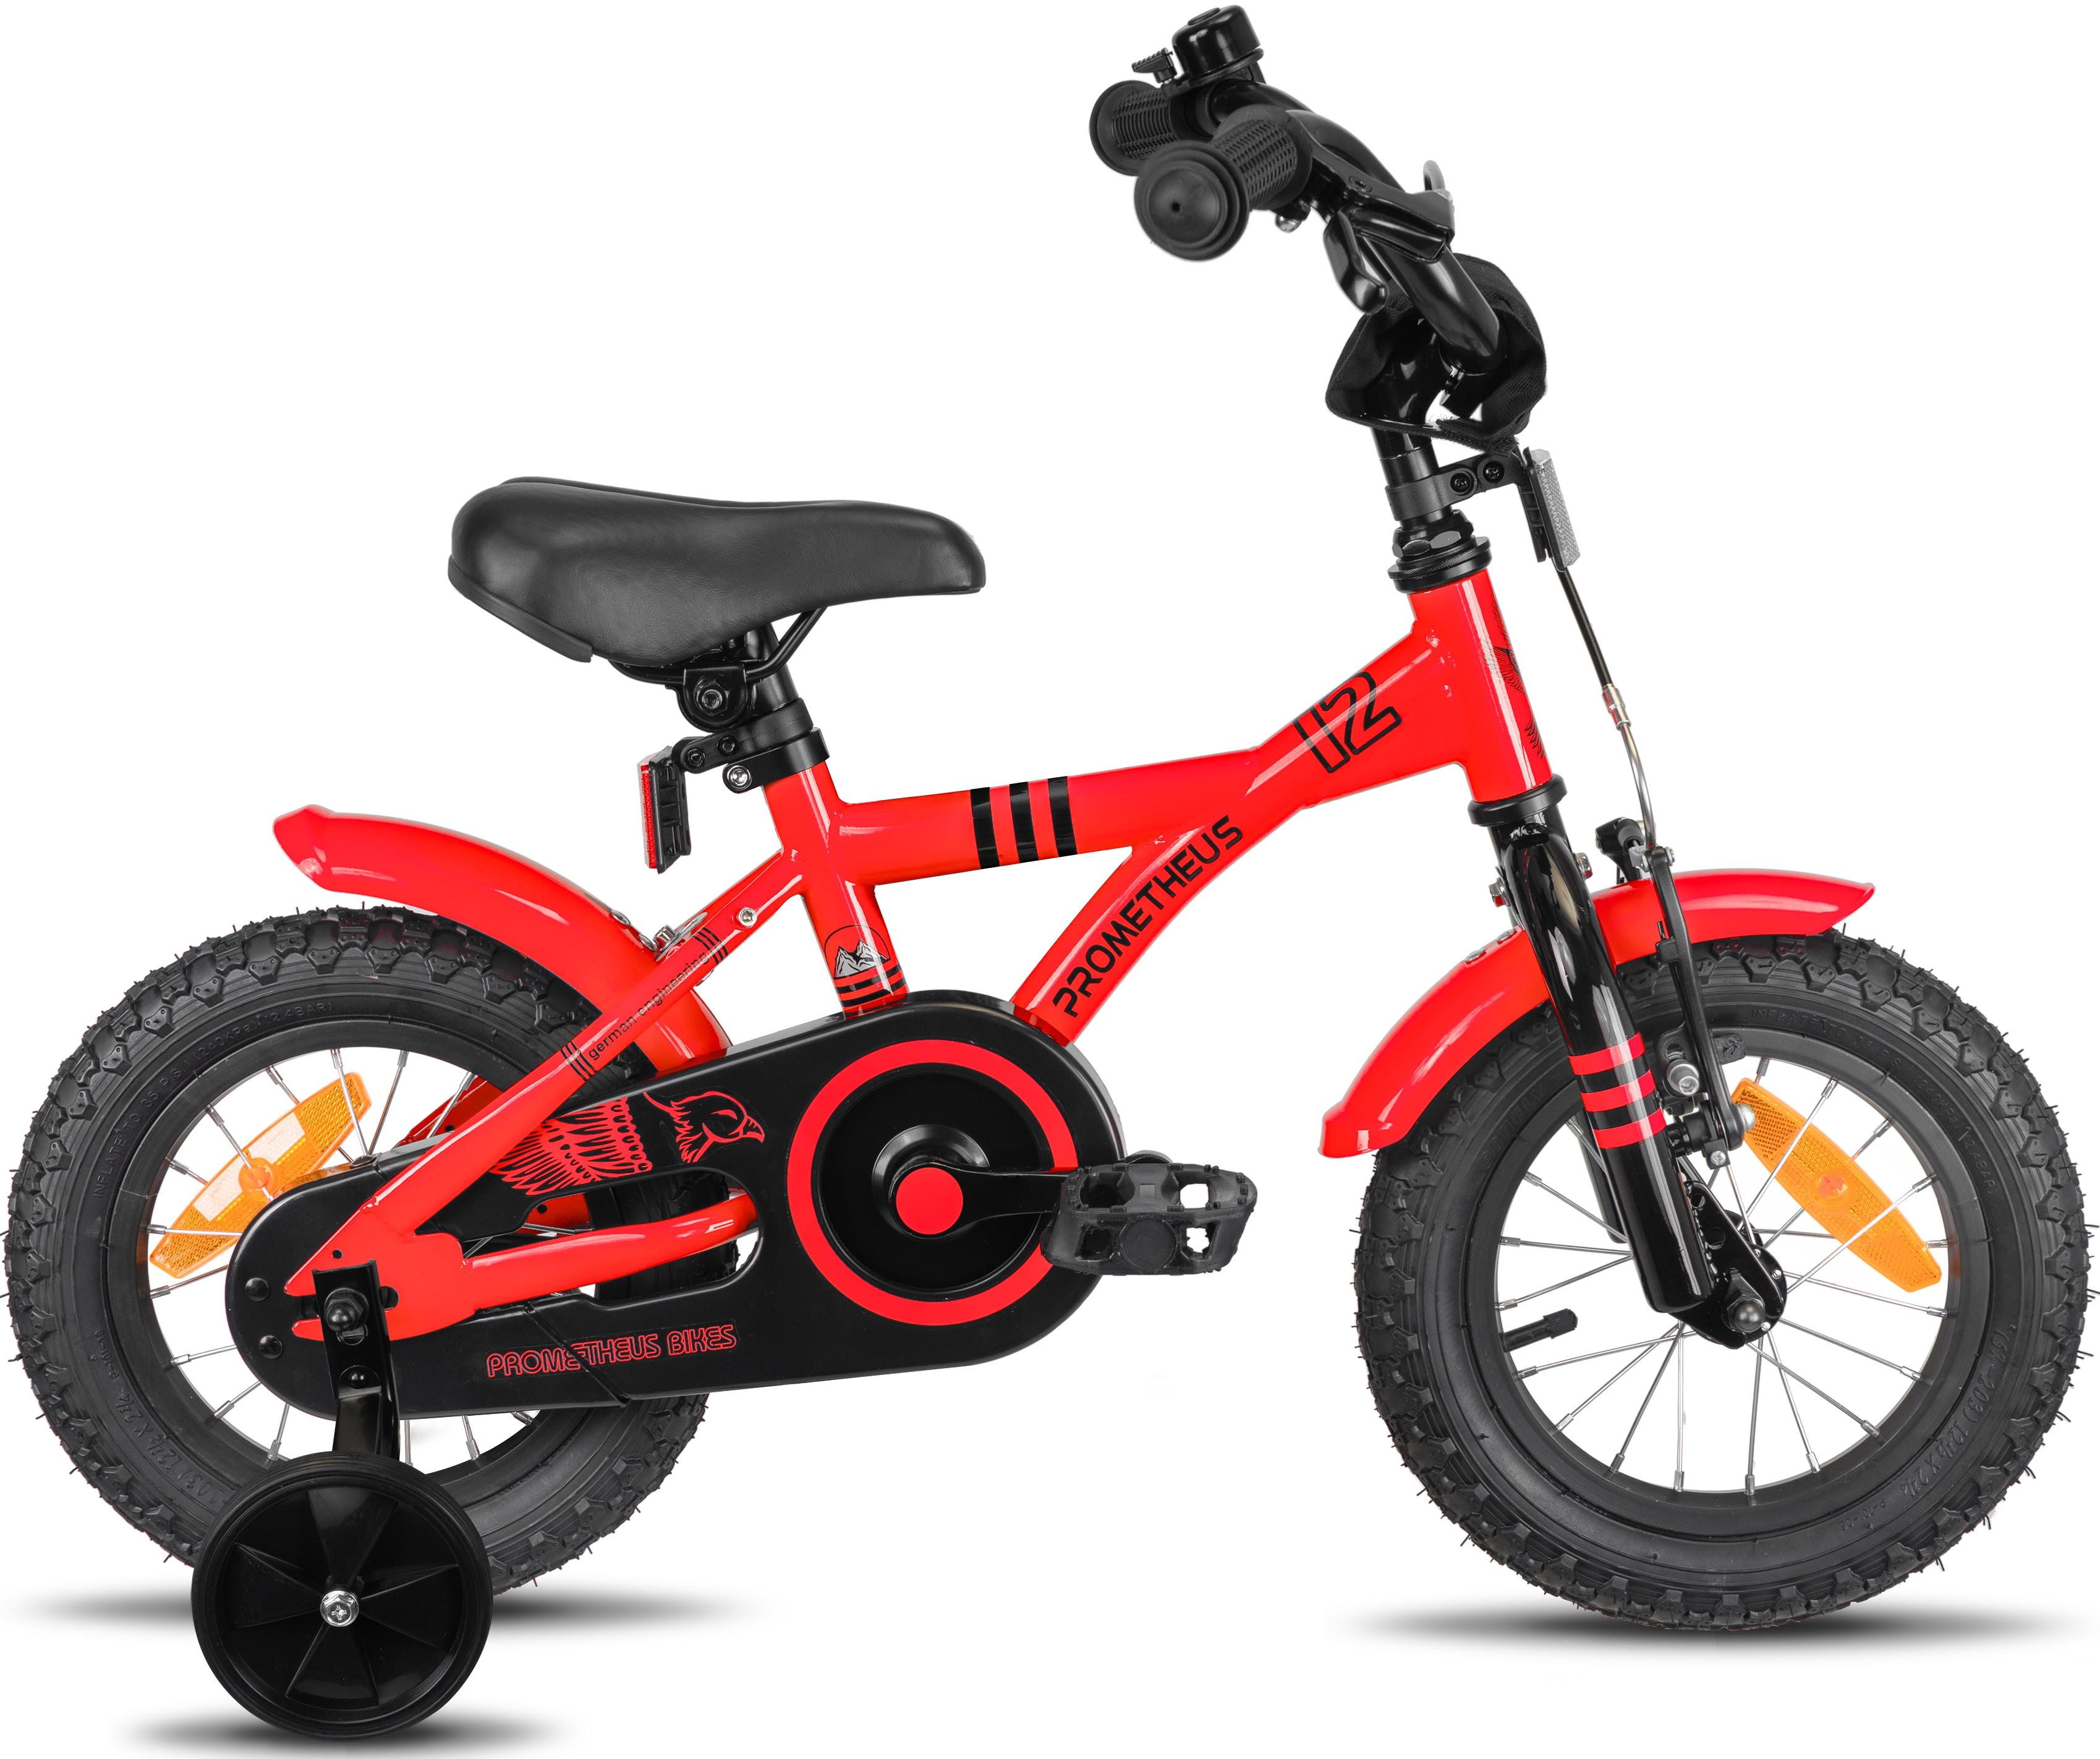 PROMETHEUS BICYCLES Kinderfahrrad Hawk rot Kinder Kinderfahrräder Fahrräder Zubehör Fahrrad